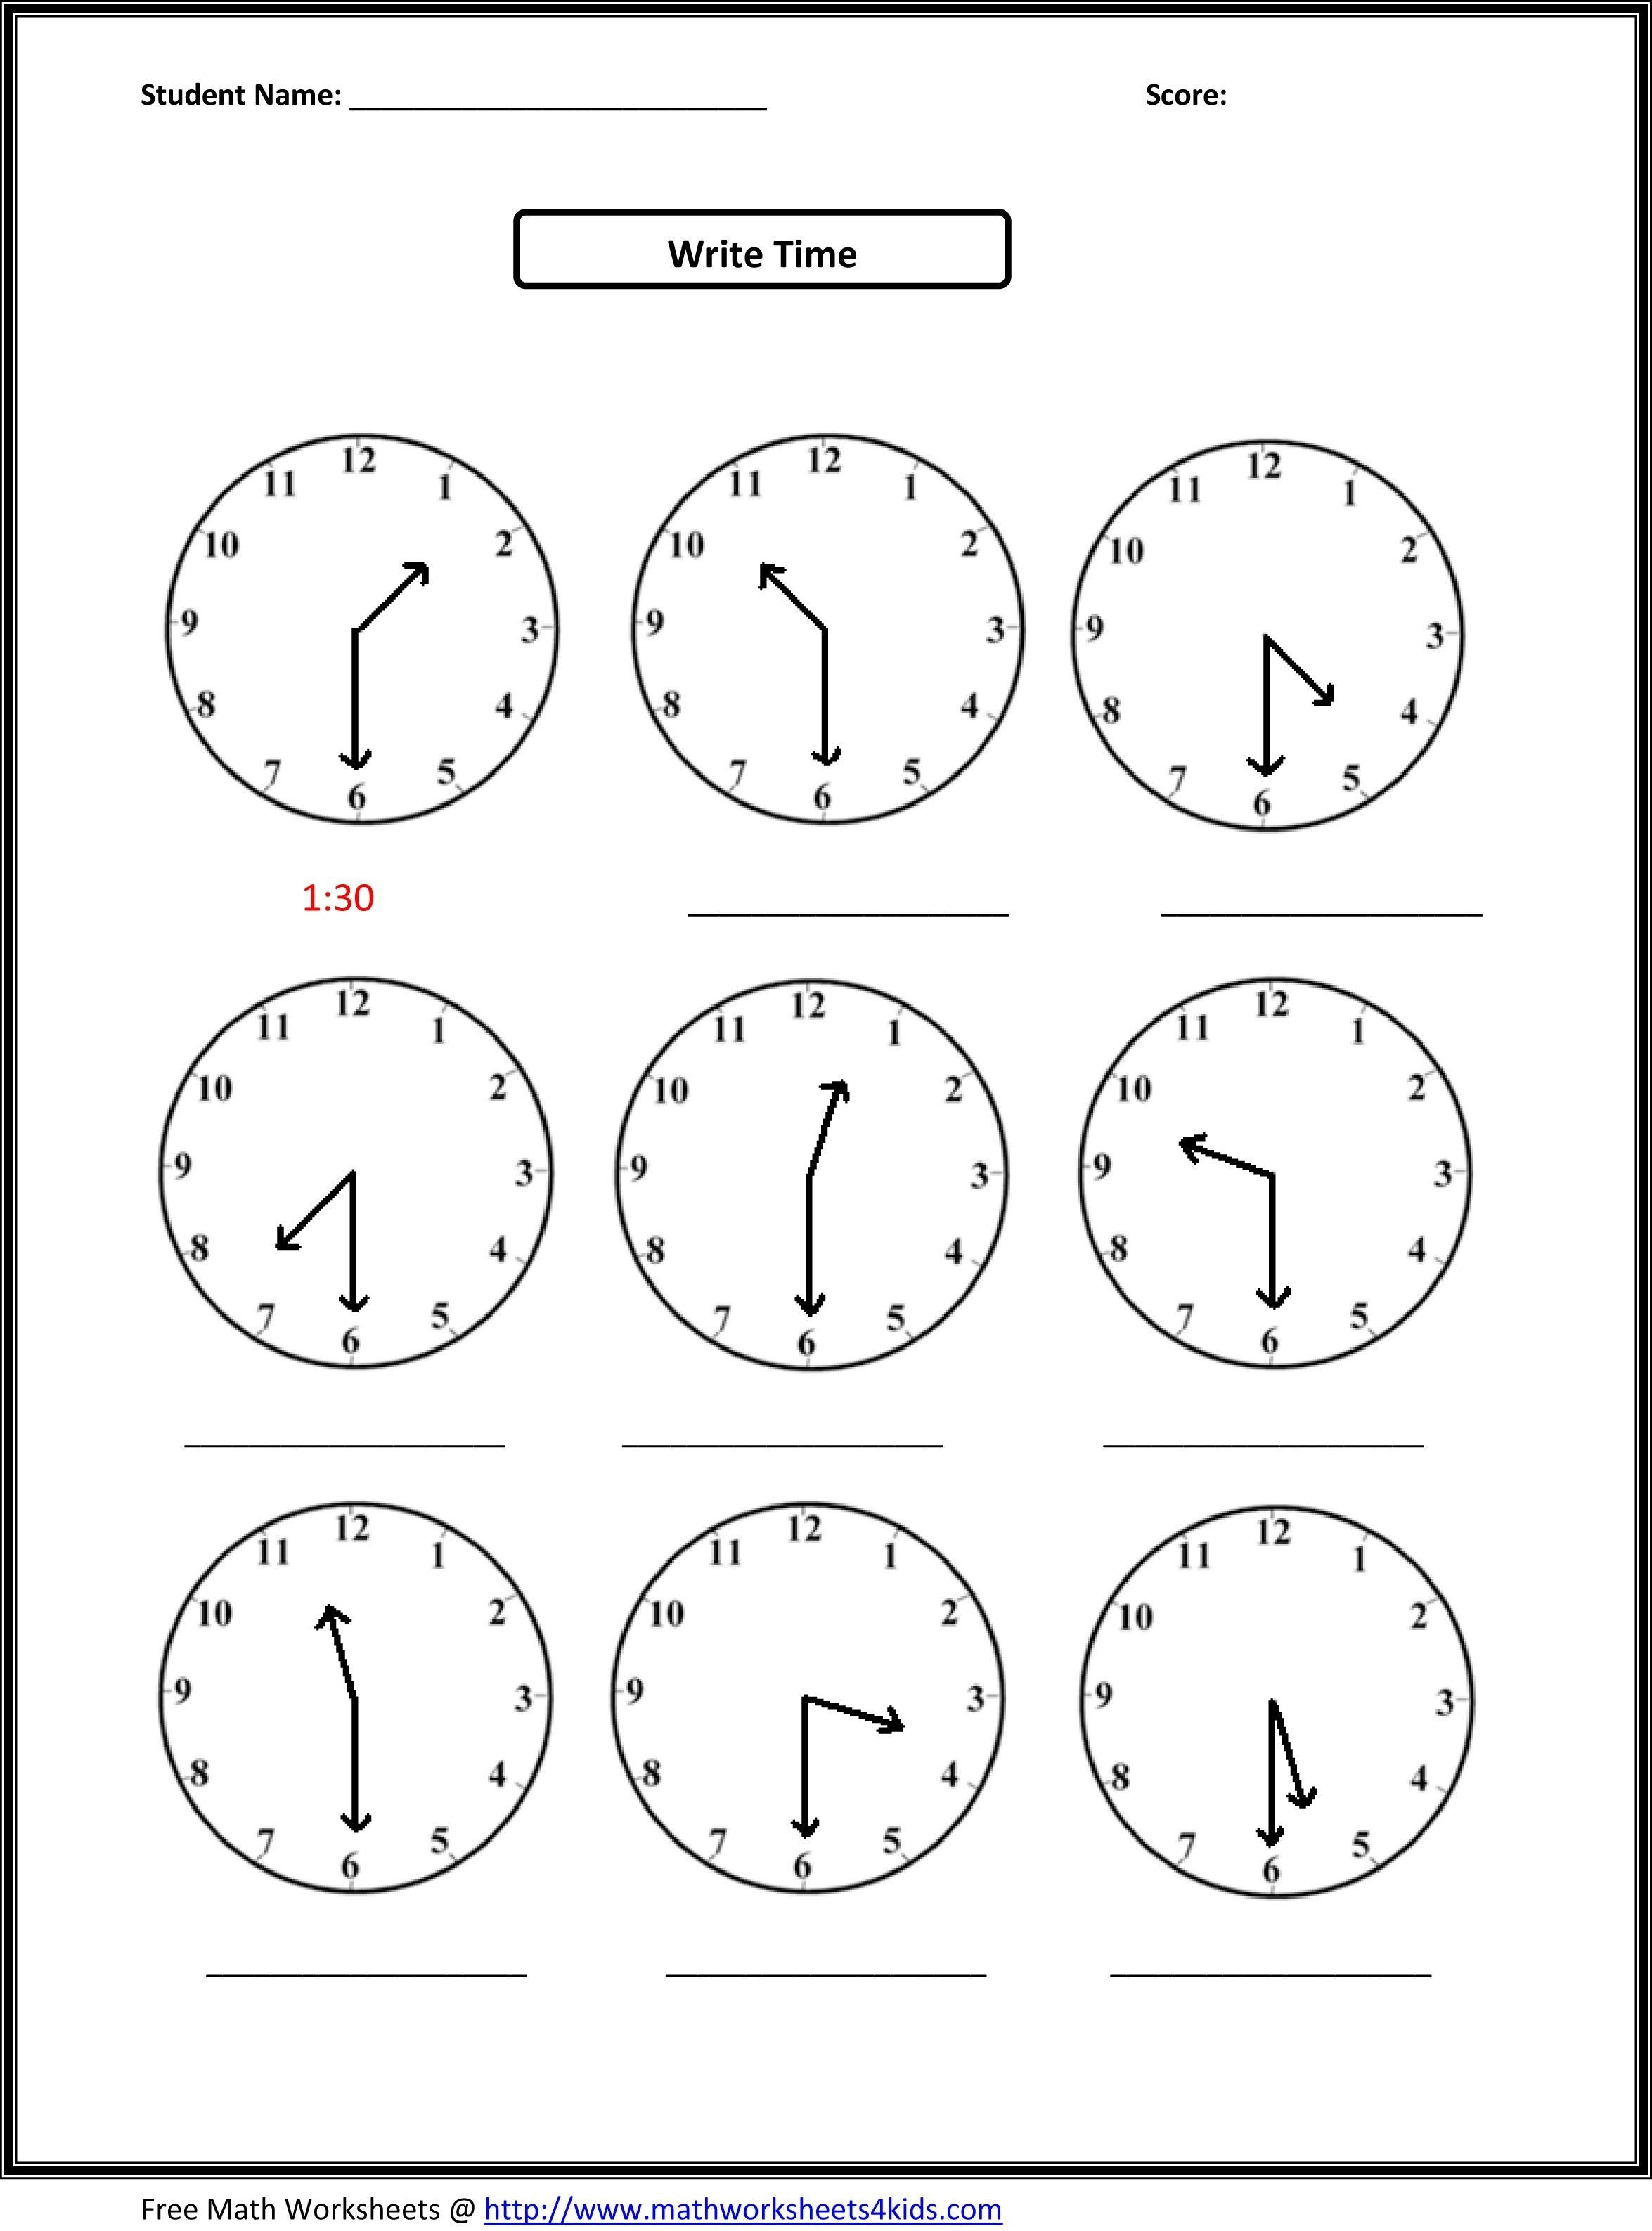 Telling Time Worksheets Ks3 New Clock Grade 3 Free Maths Printables - Free Printable Telling Time Worksheets